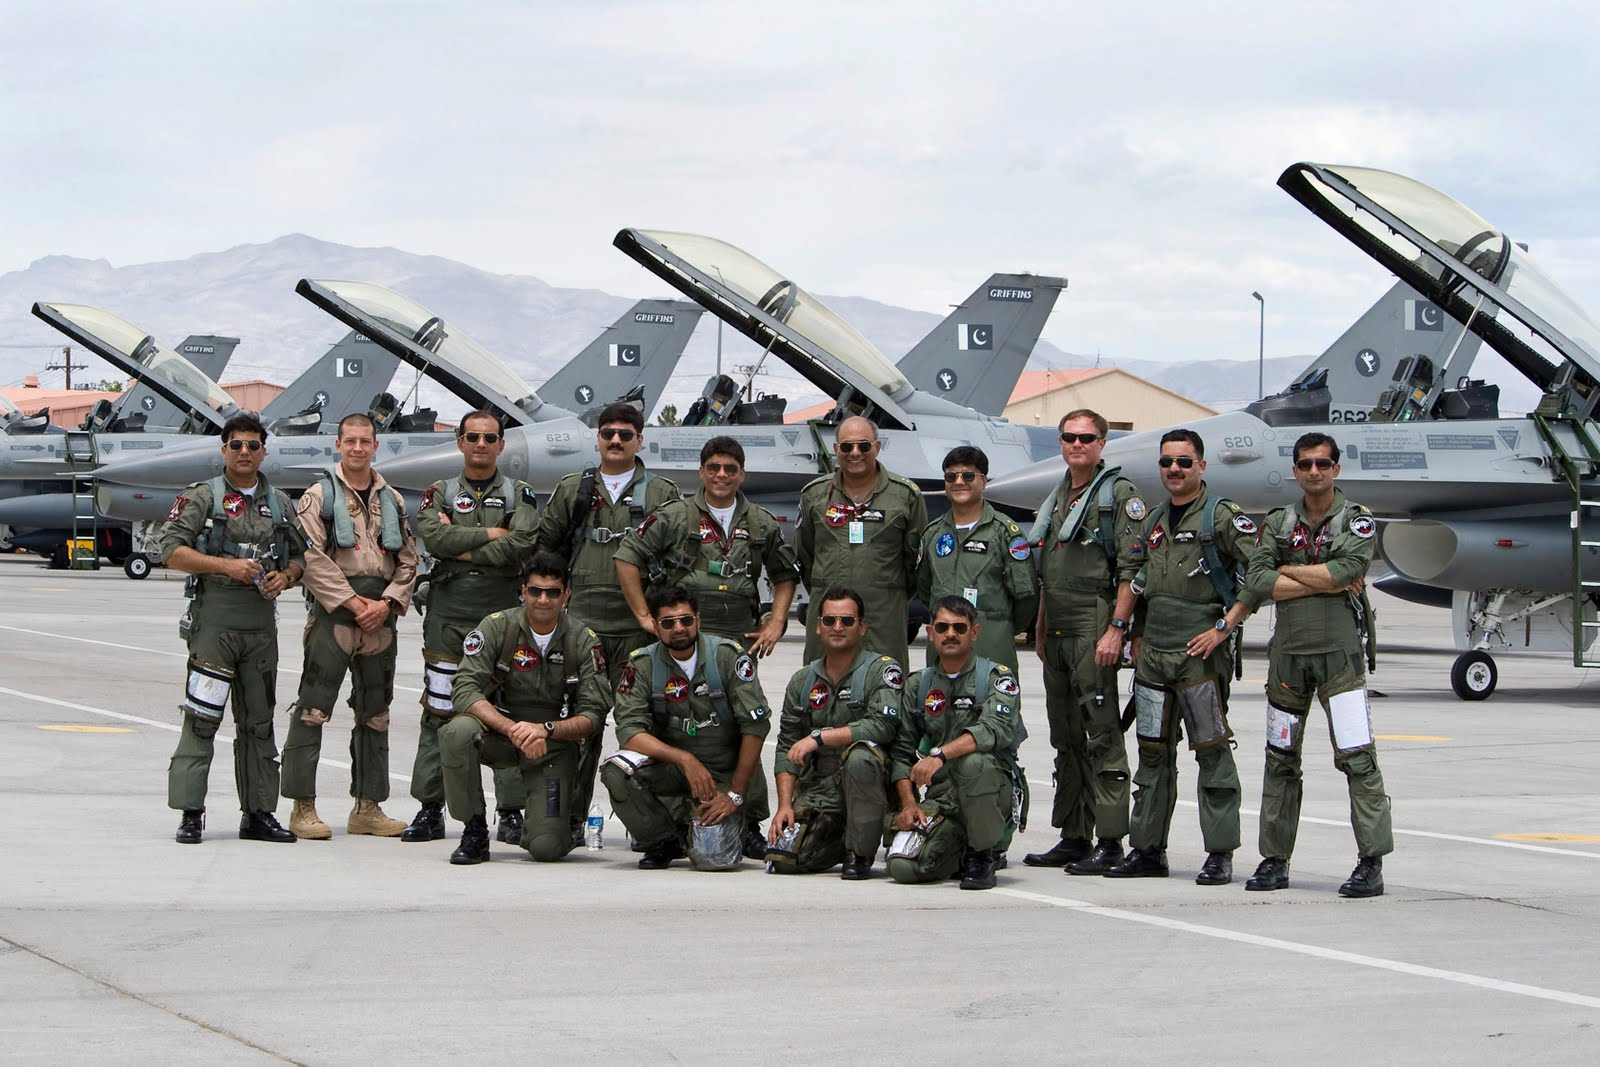 http://4.bp.blogspot.com/-QMRJ3dE7fBQ/UPLpyMBXAHI/AAAAAAAAEcw/LXs4fOzPJlk/s1600/Pakistan+Air+Force+New+Wallpapers+2013+(3).jpg